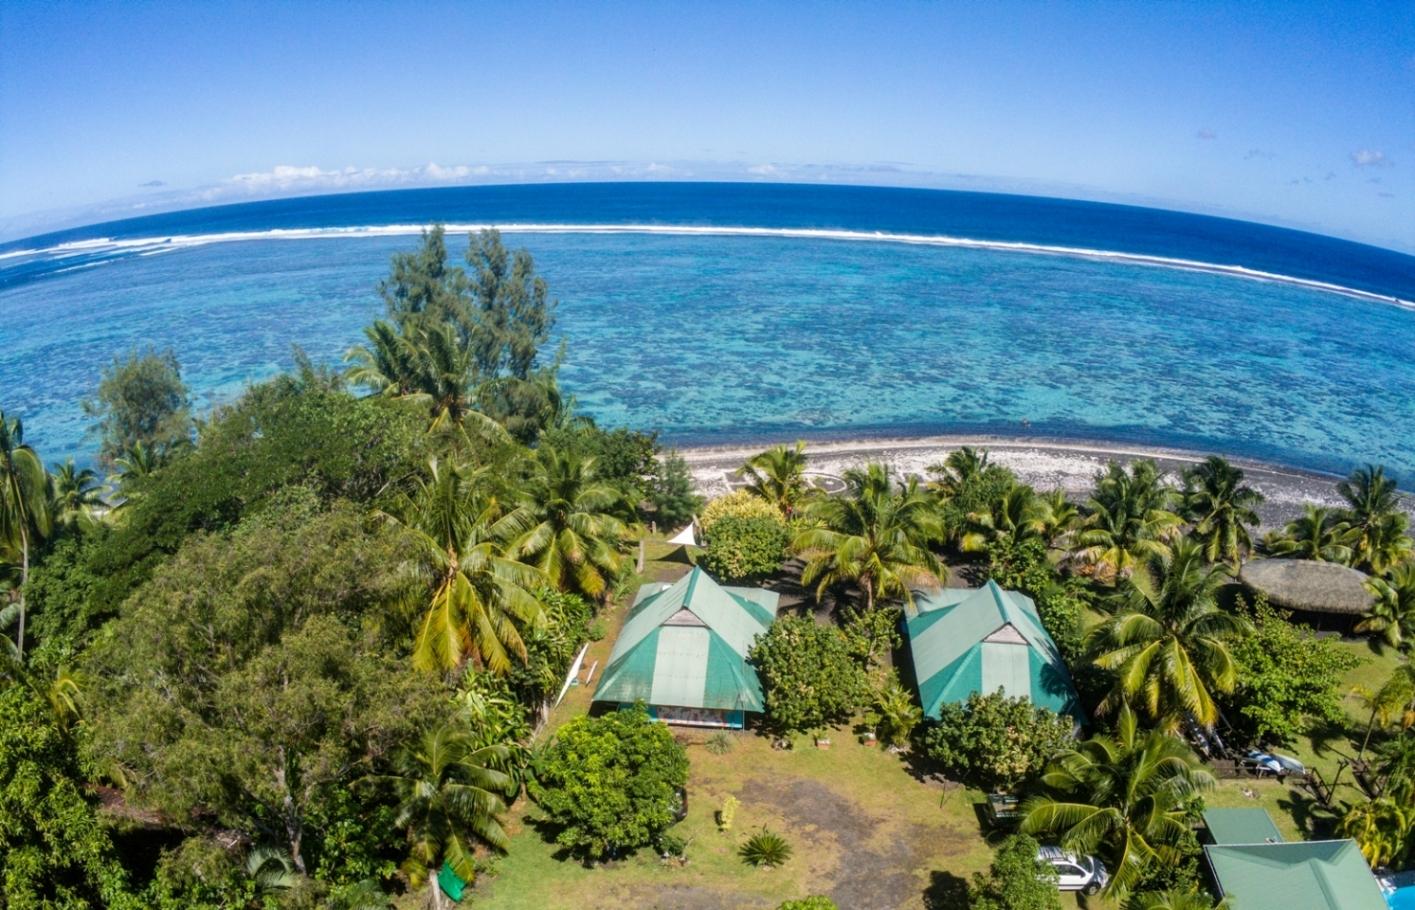 https://tahititourisme.ca/wp-content/uploads/2019/08/copie-Tahiti-tourisme-948ko.jpg